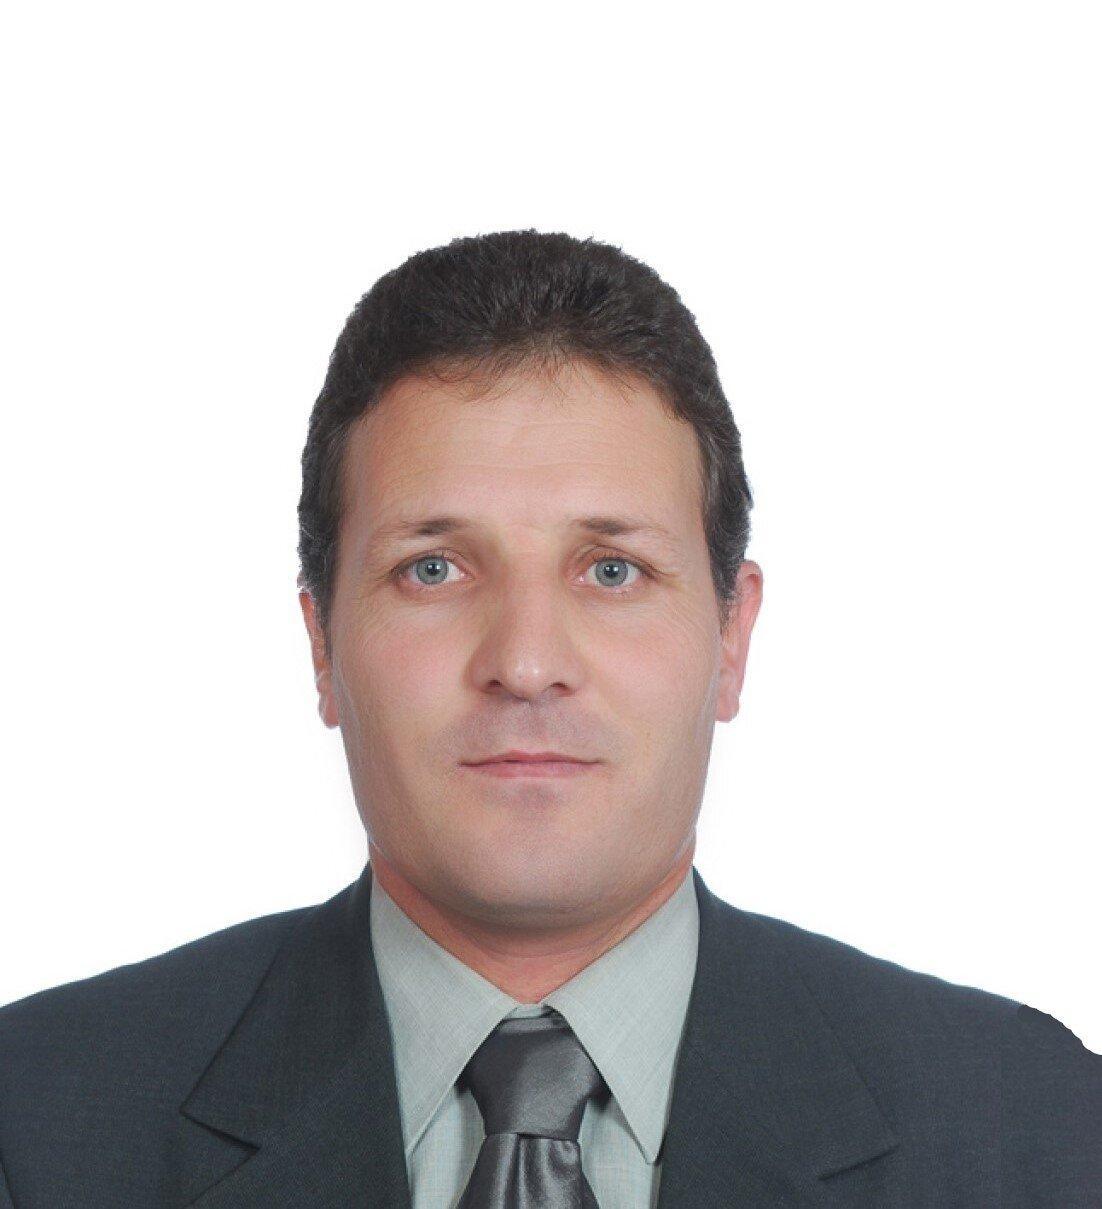 Abe Eazadi